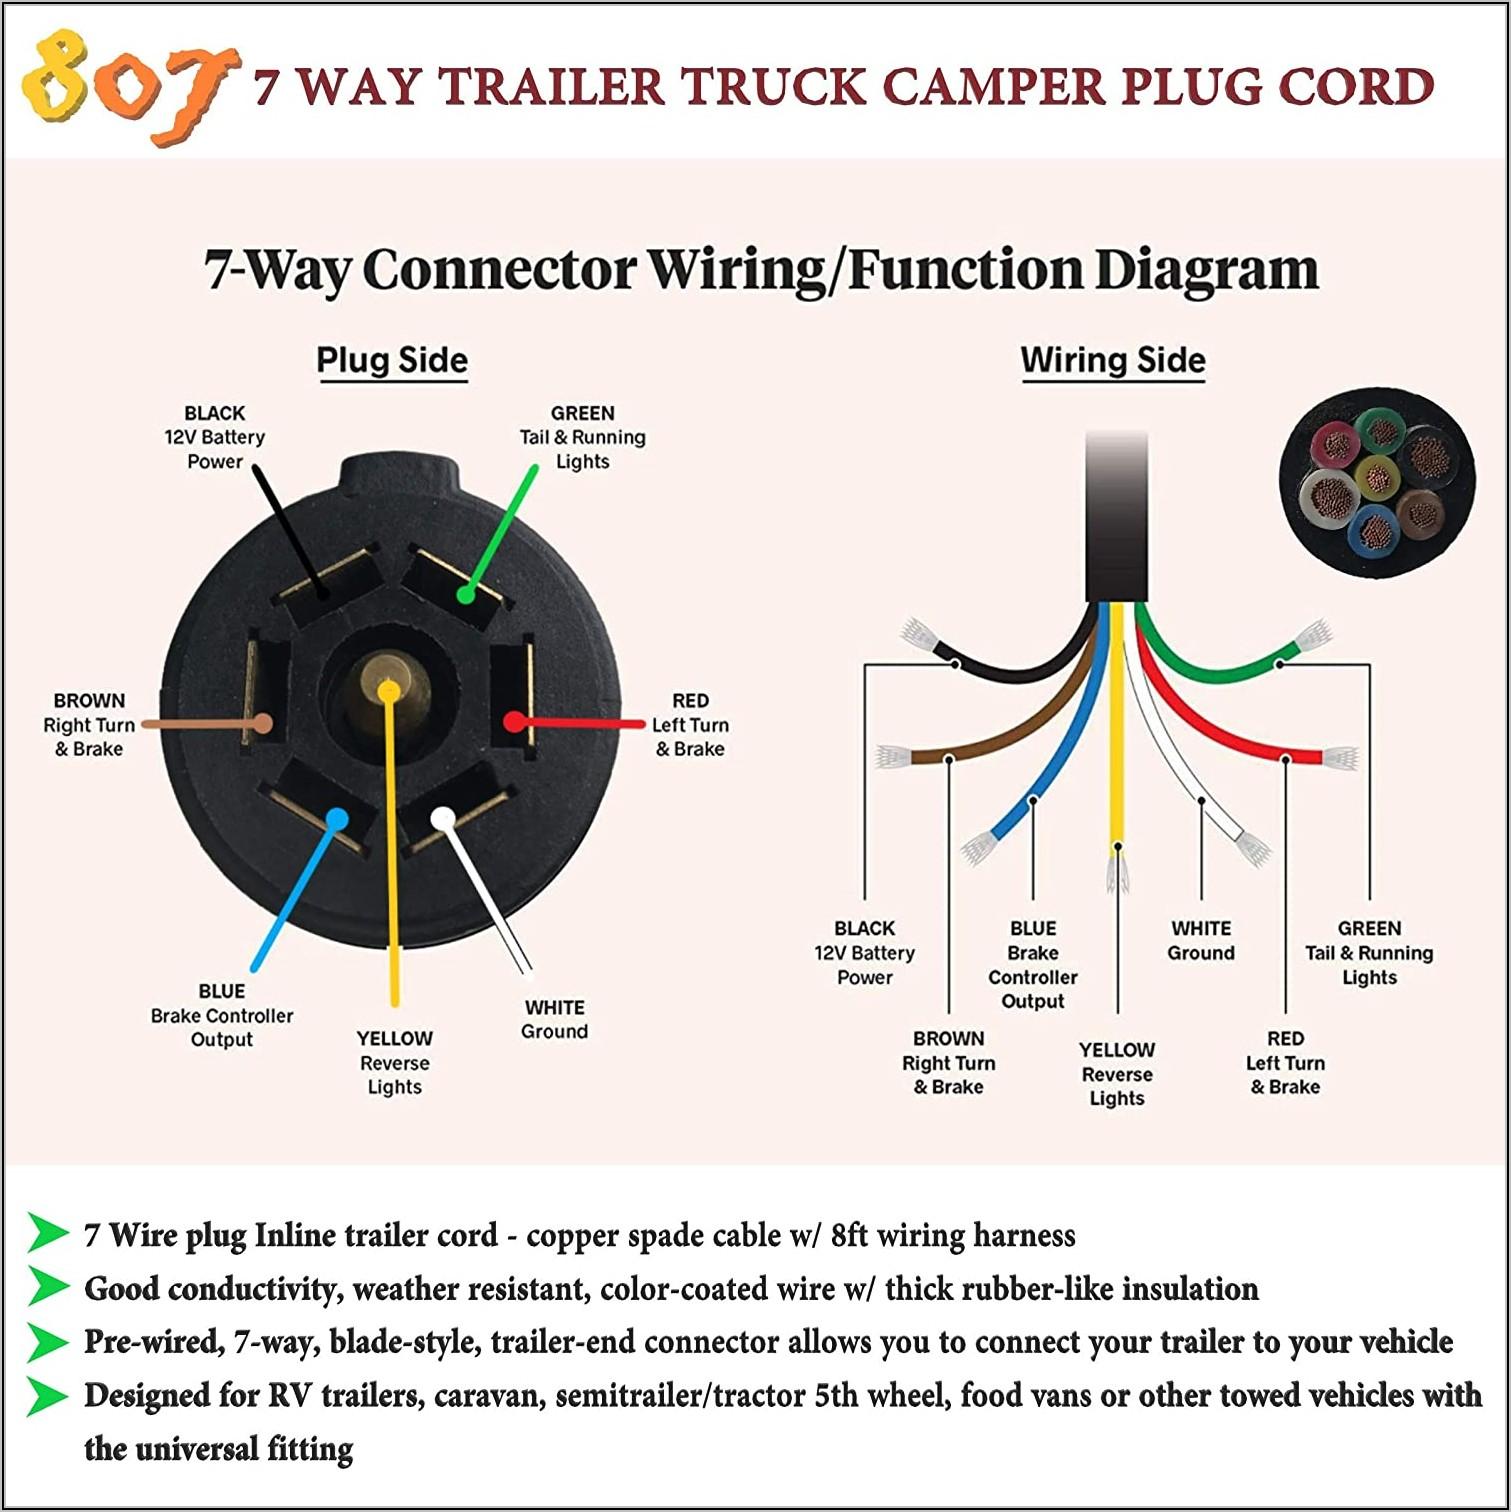 1998 Chevy Silverado 7 Pin Trailer Wiring Diagram